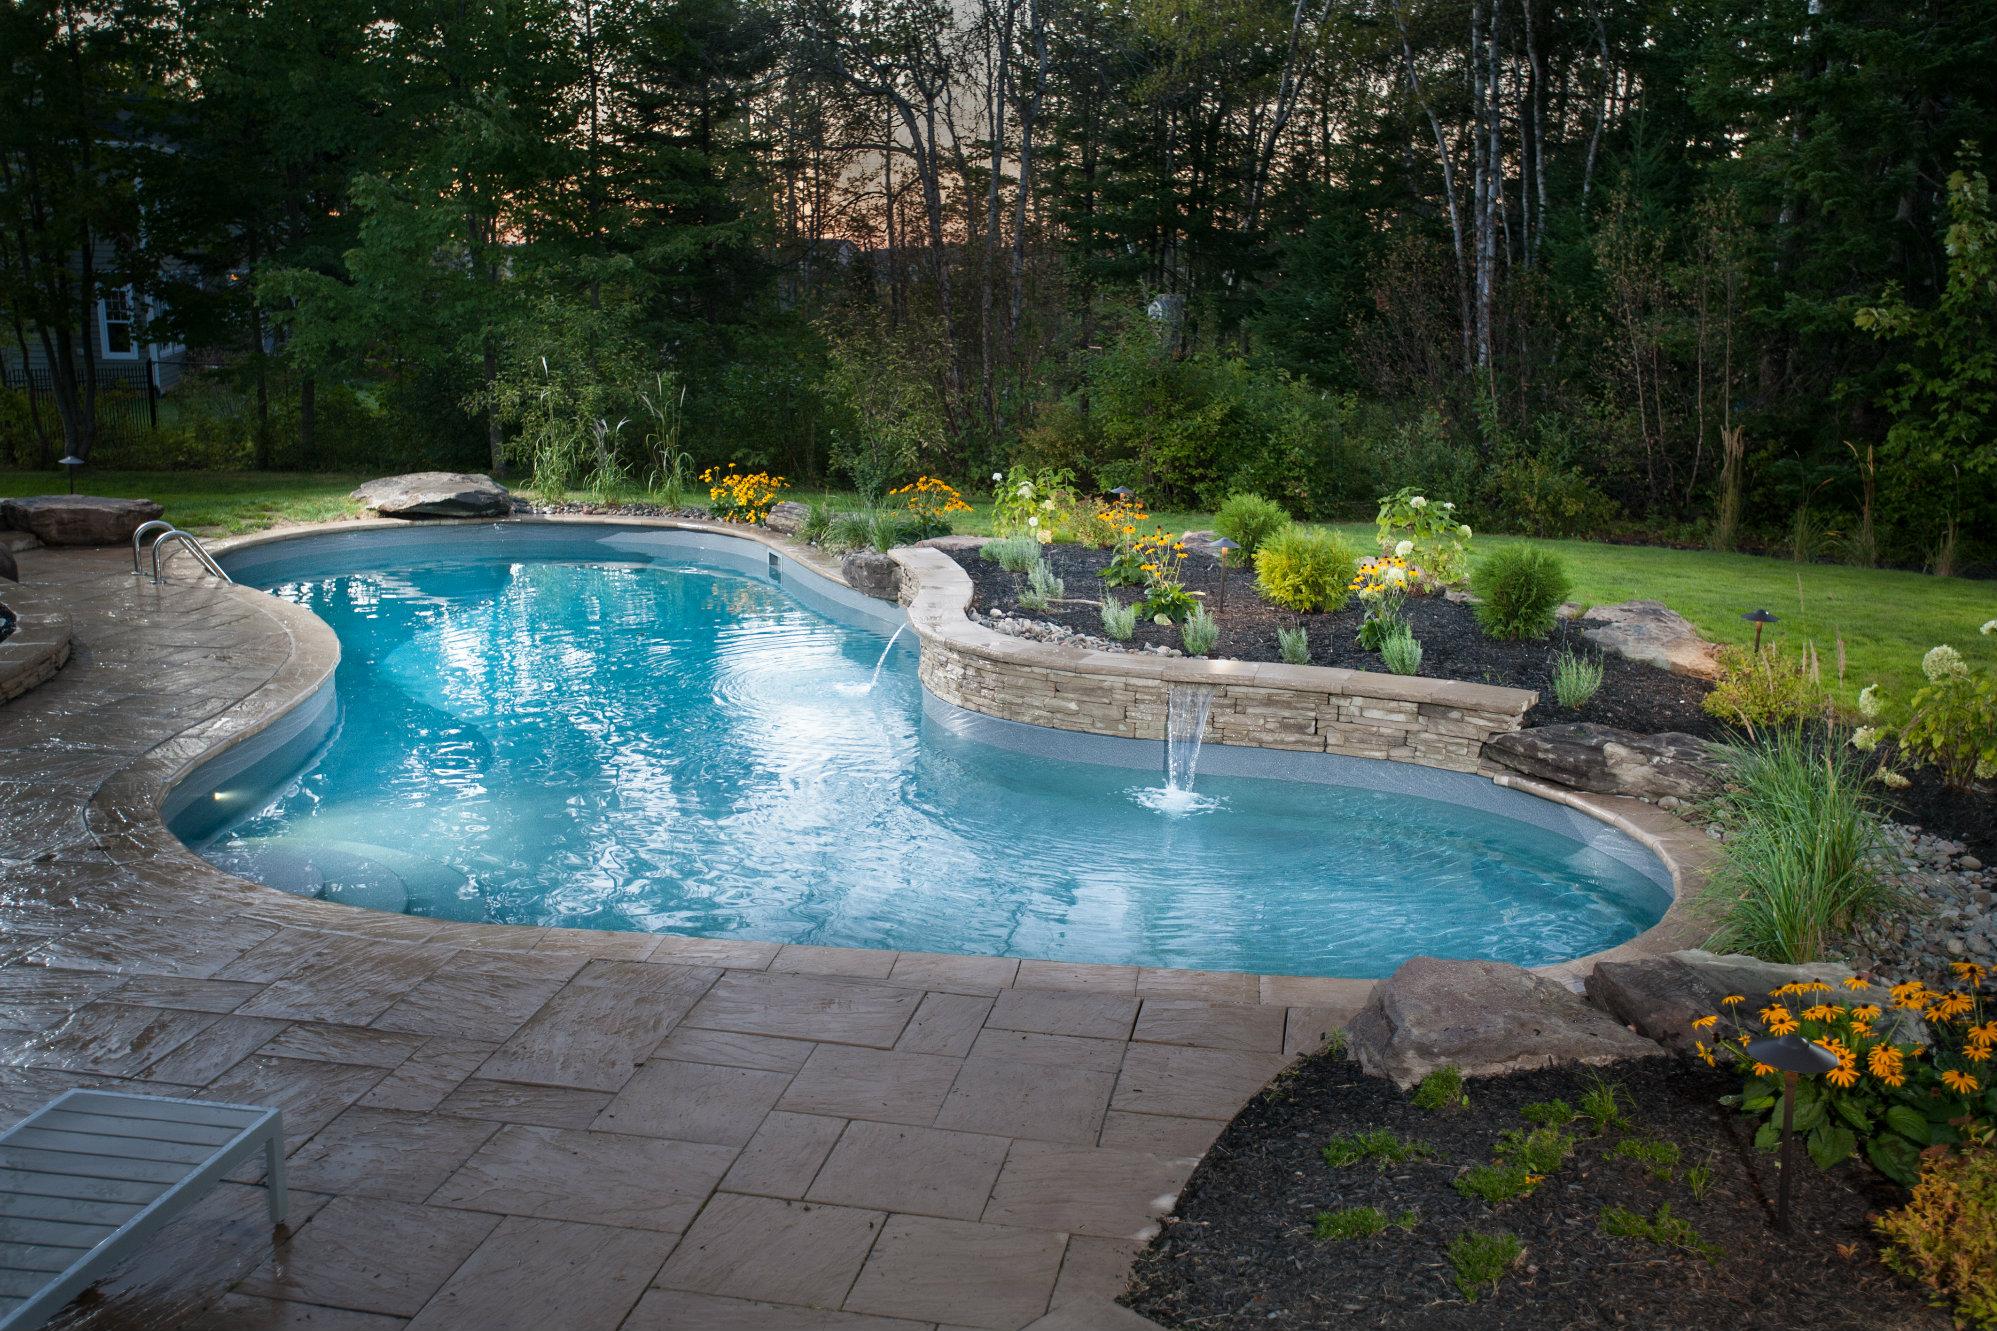 Rustic charm pool spa news awards pools design for Pool design 2016